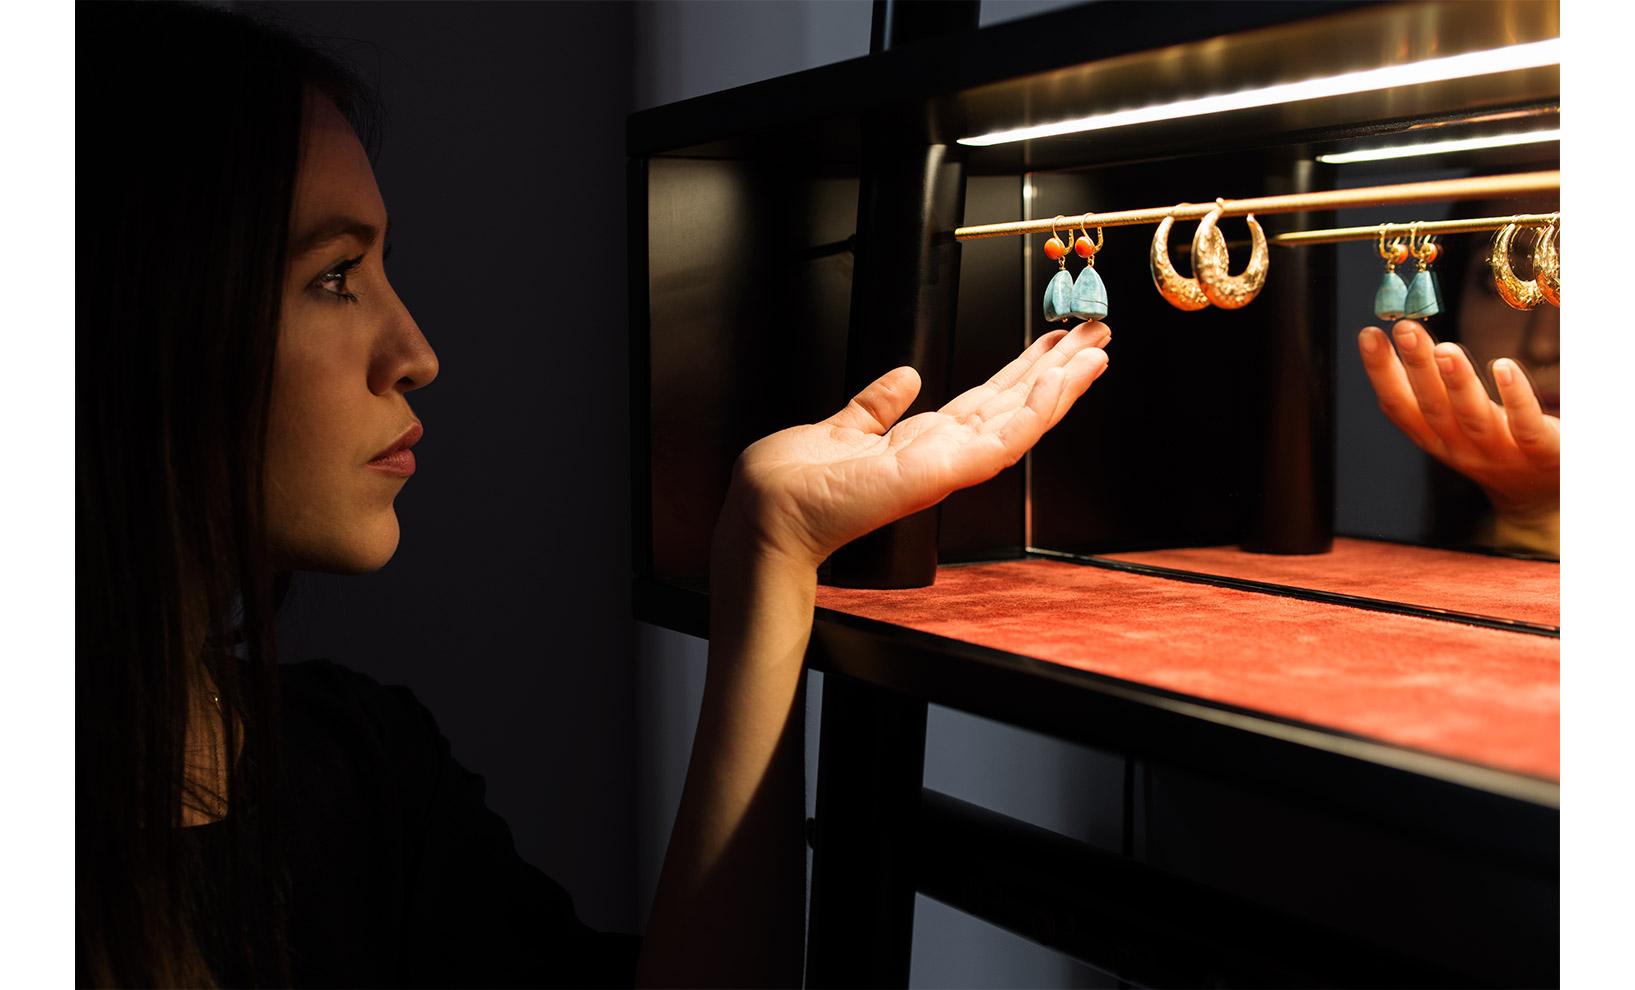 marco-tacchini-photographer-jewel-box_11